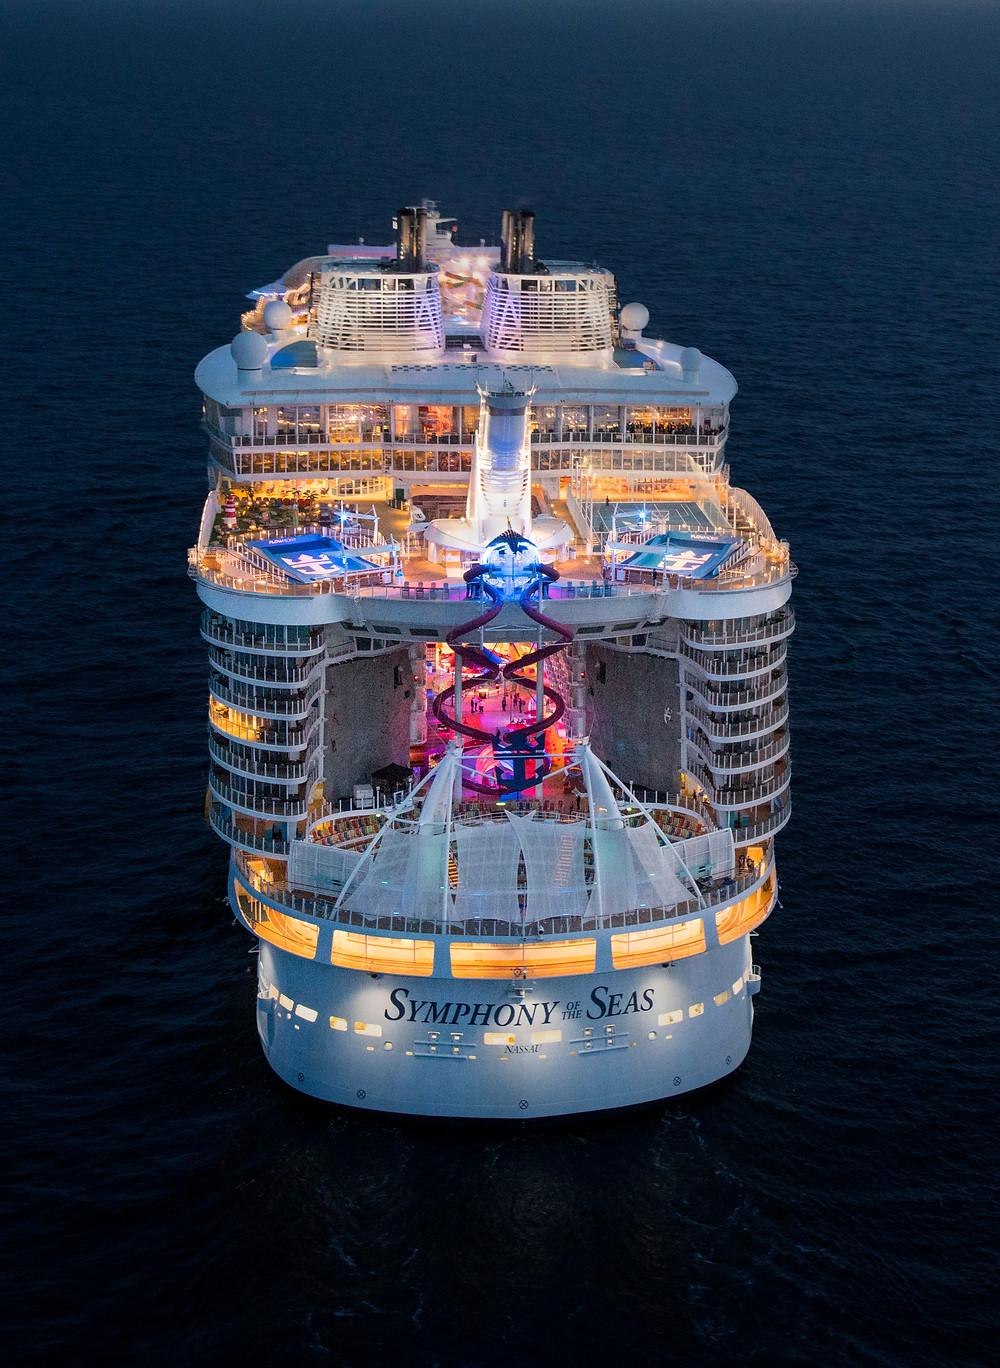 Symphony of the Seas| Royal Caribbean International Asset